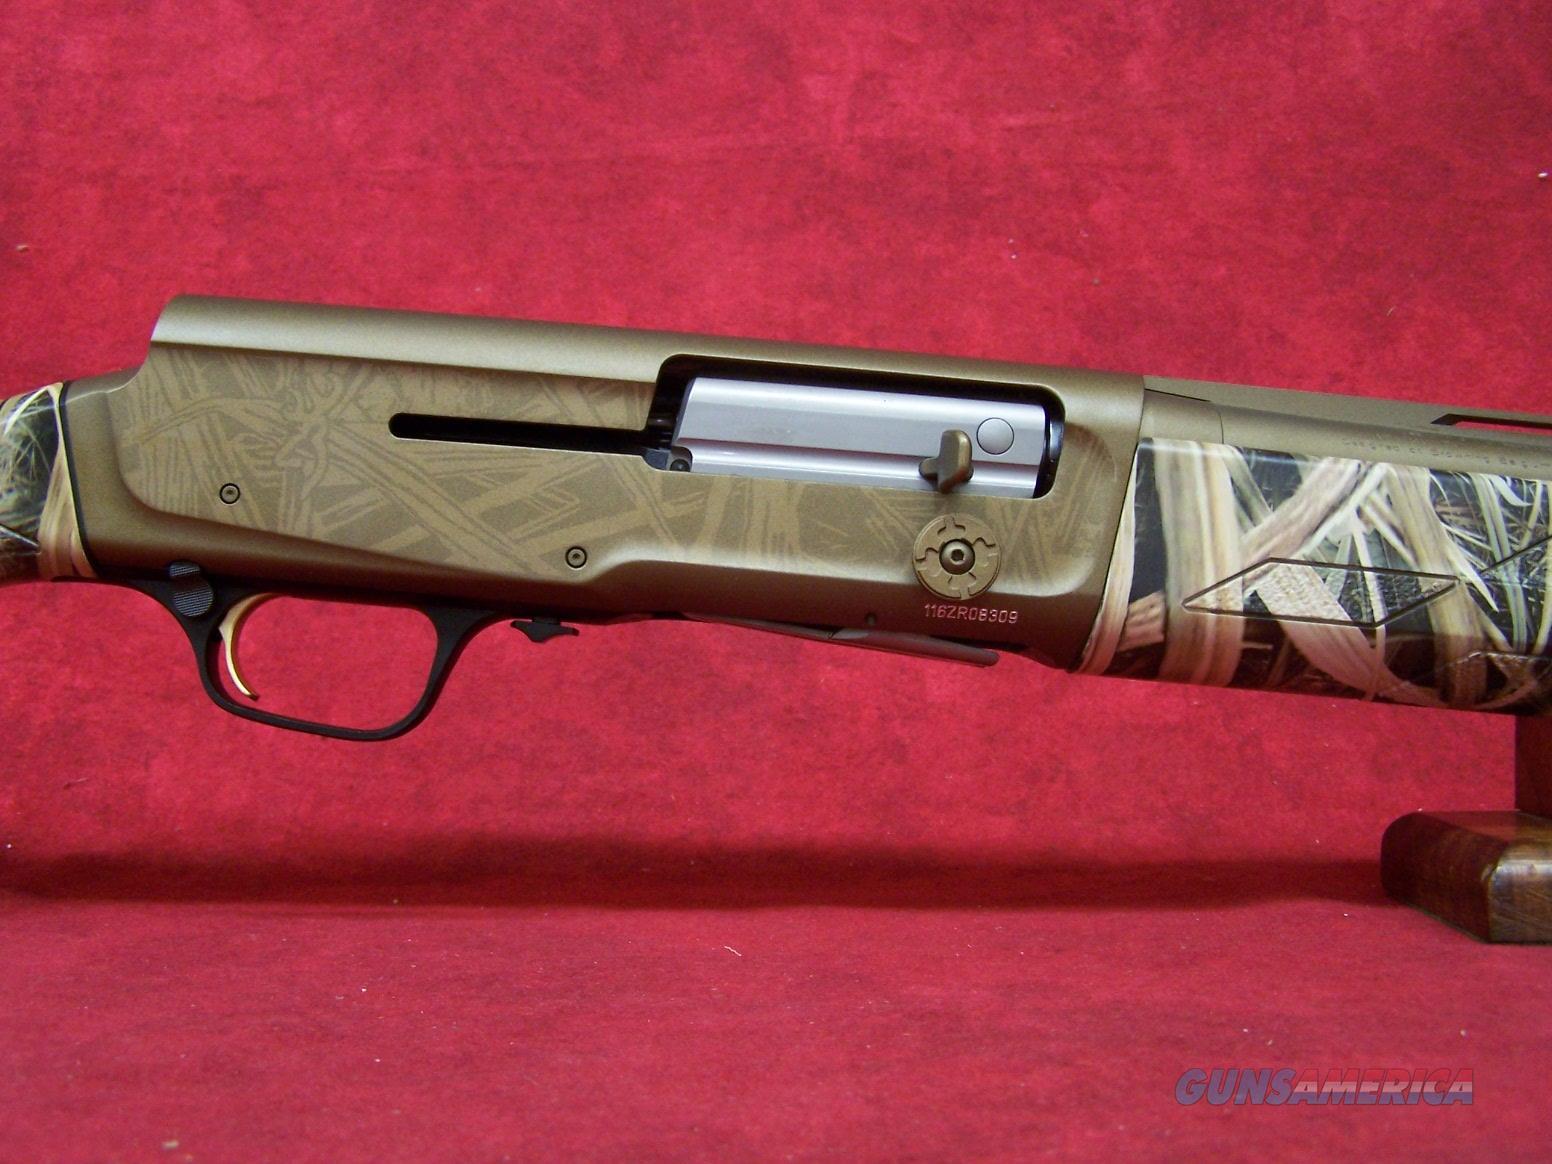 "Browning A5 Wicked Wing MOSGB DT 12ga 3.5""  26"" Barrel (0118412005)  Guns > Shotguns > Browning Shotguns > Autoloaders > Hunting"